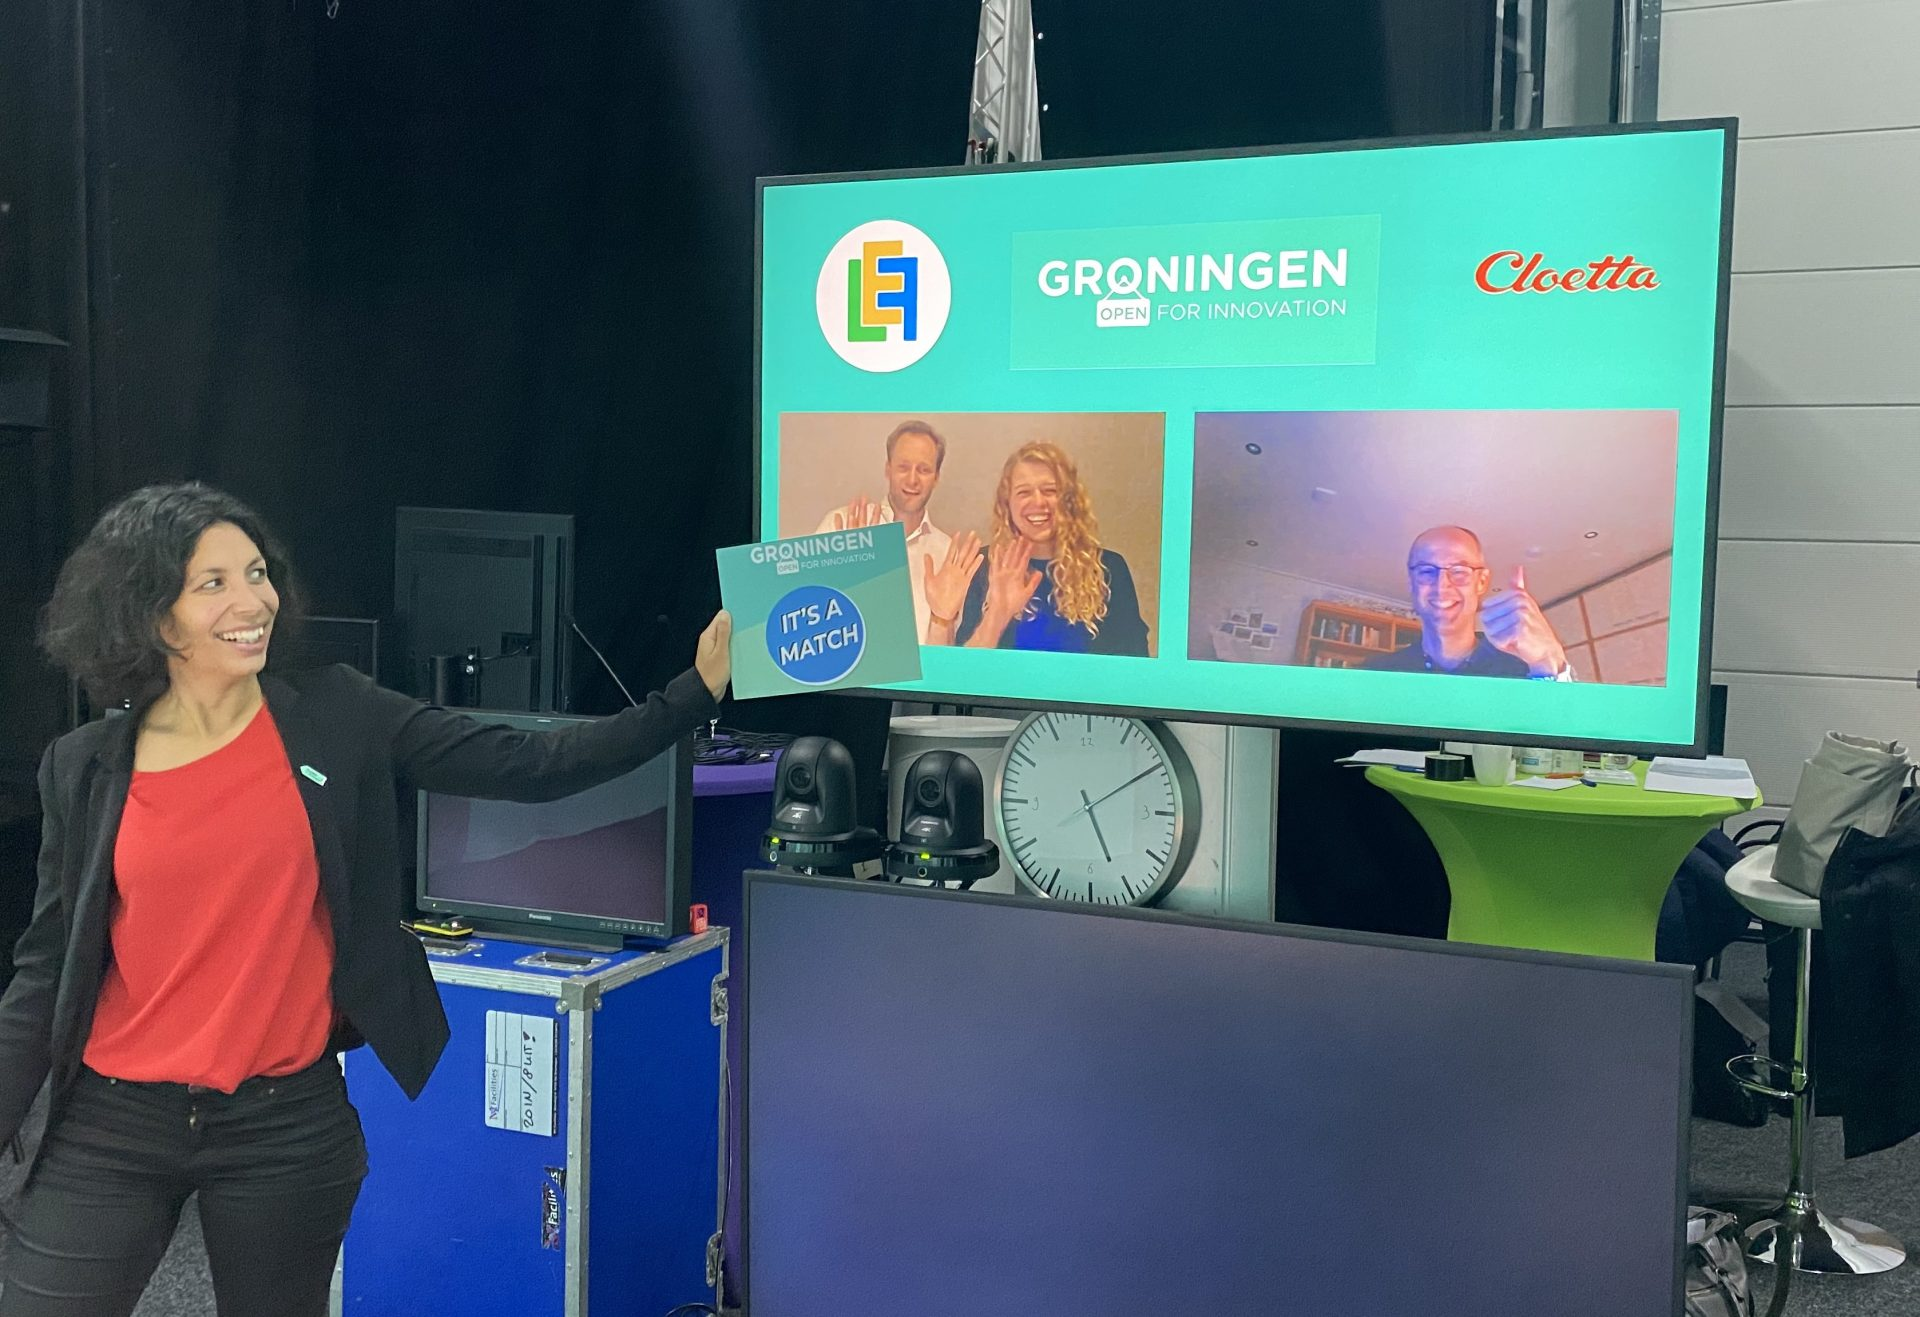 Cloetta, FC Groningen en MercachemSyncom starten samenwerking met startups